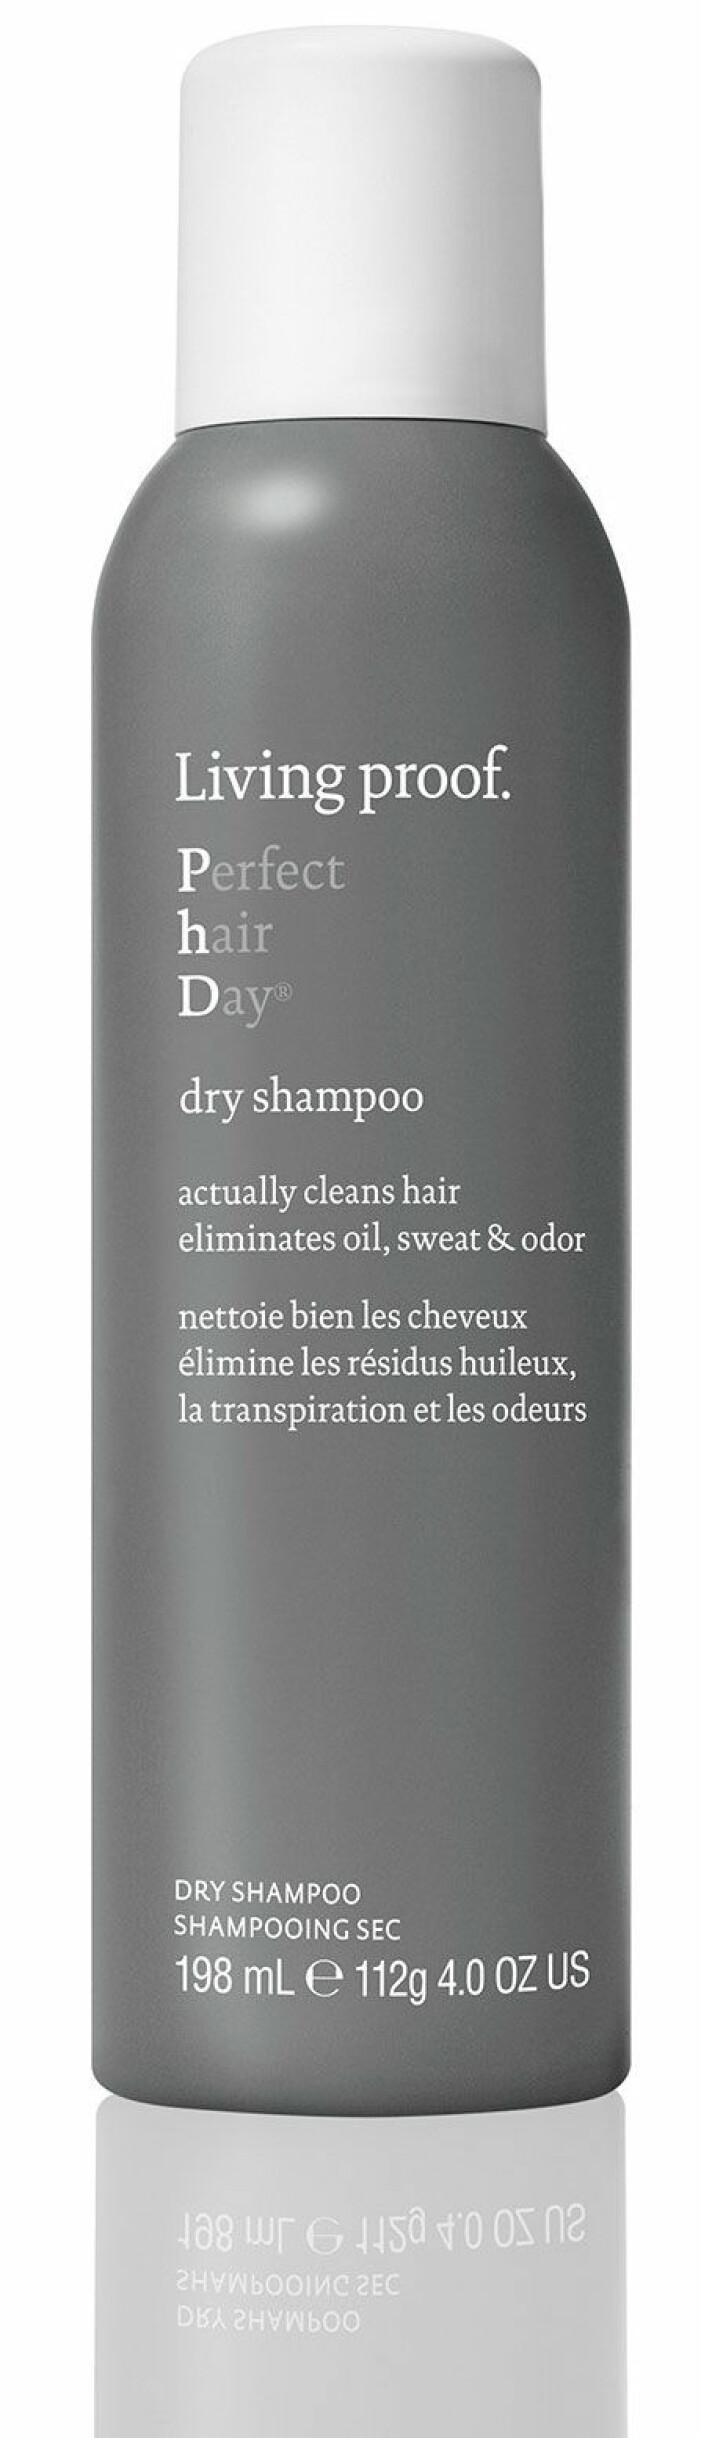 Torrschampo Perfect Hair Day Dry Schampoo från Living Proof